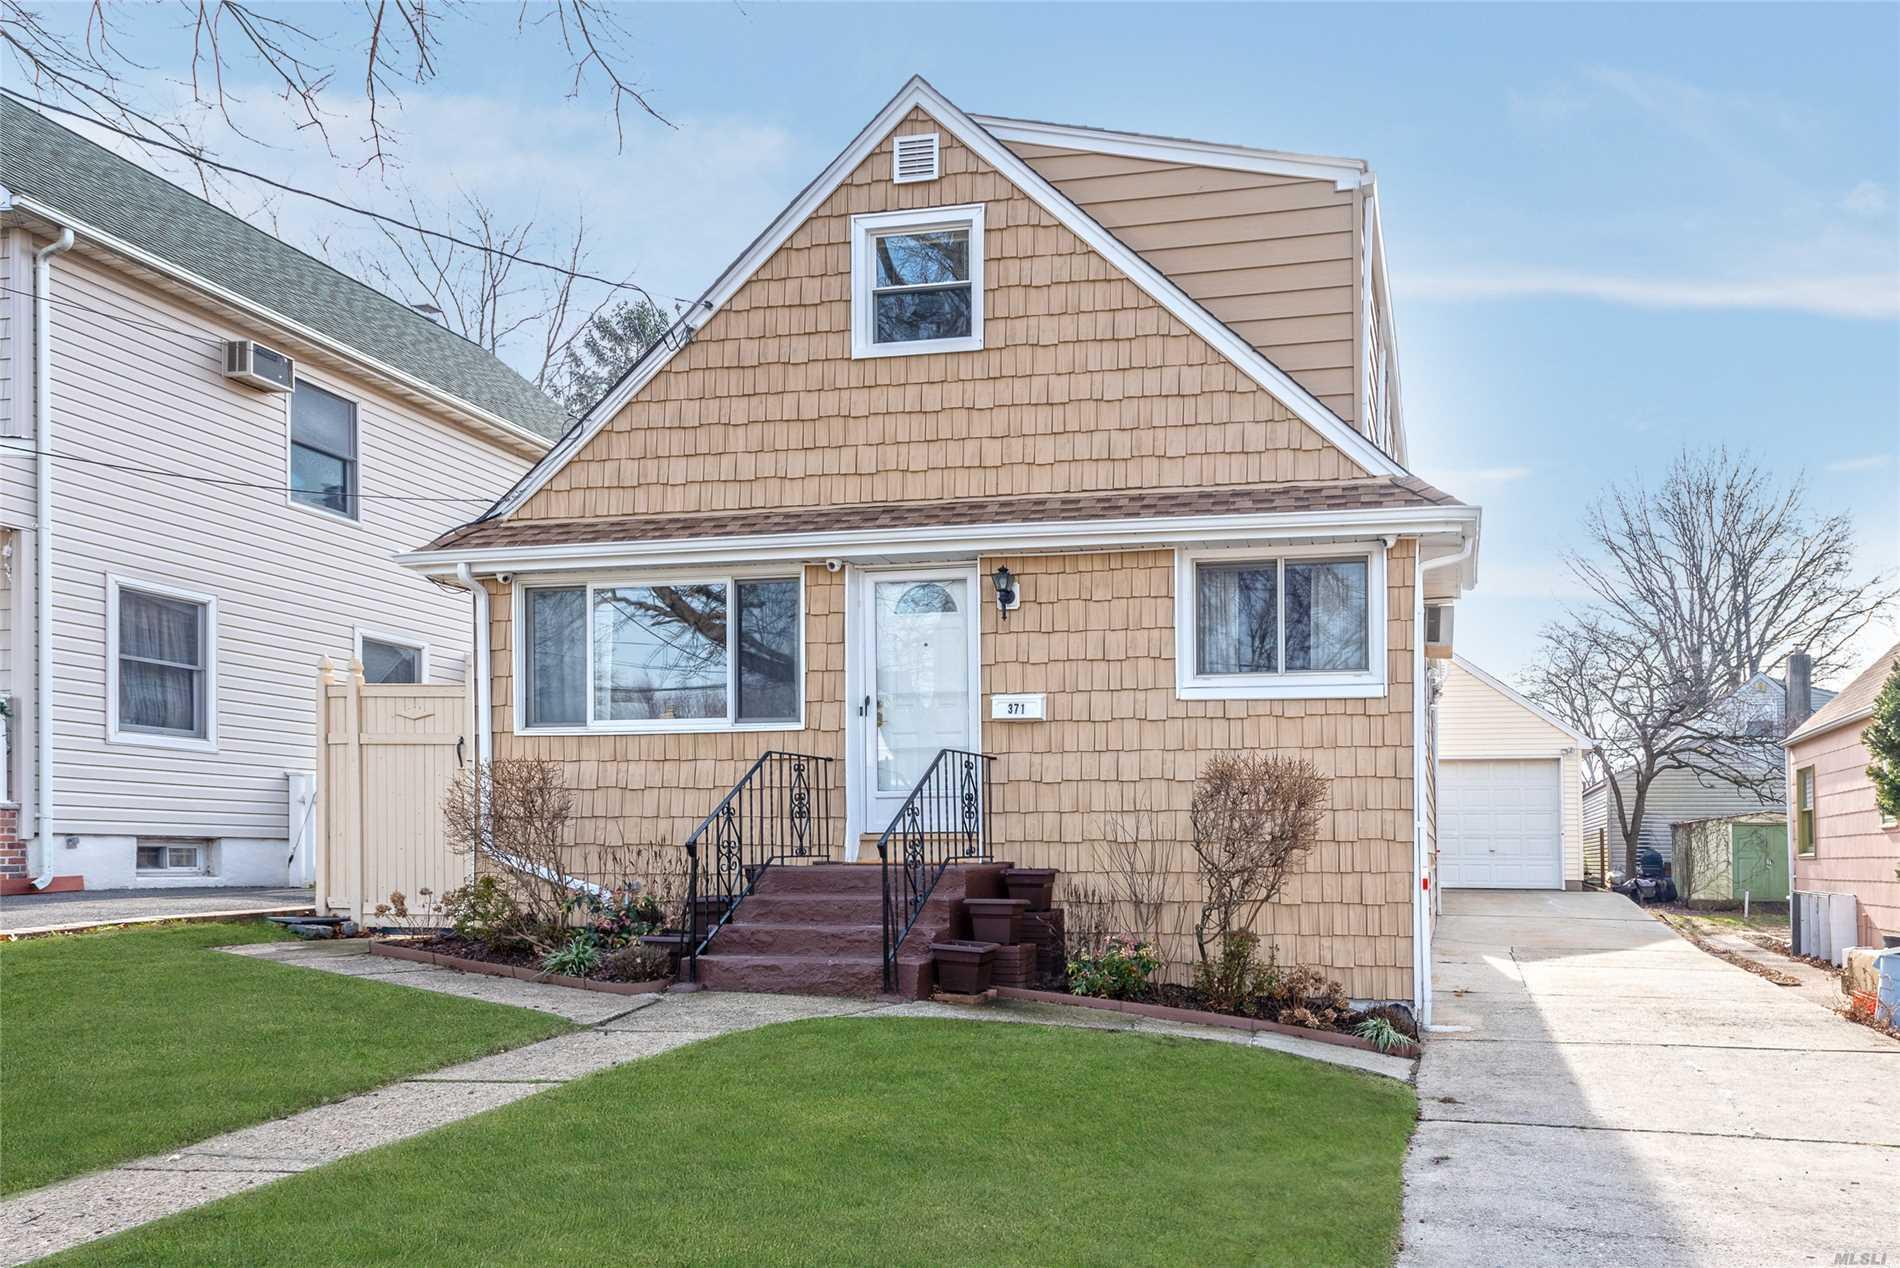 371 Hamilton Ave - W. Hempstead, New York